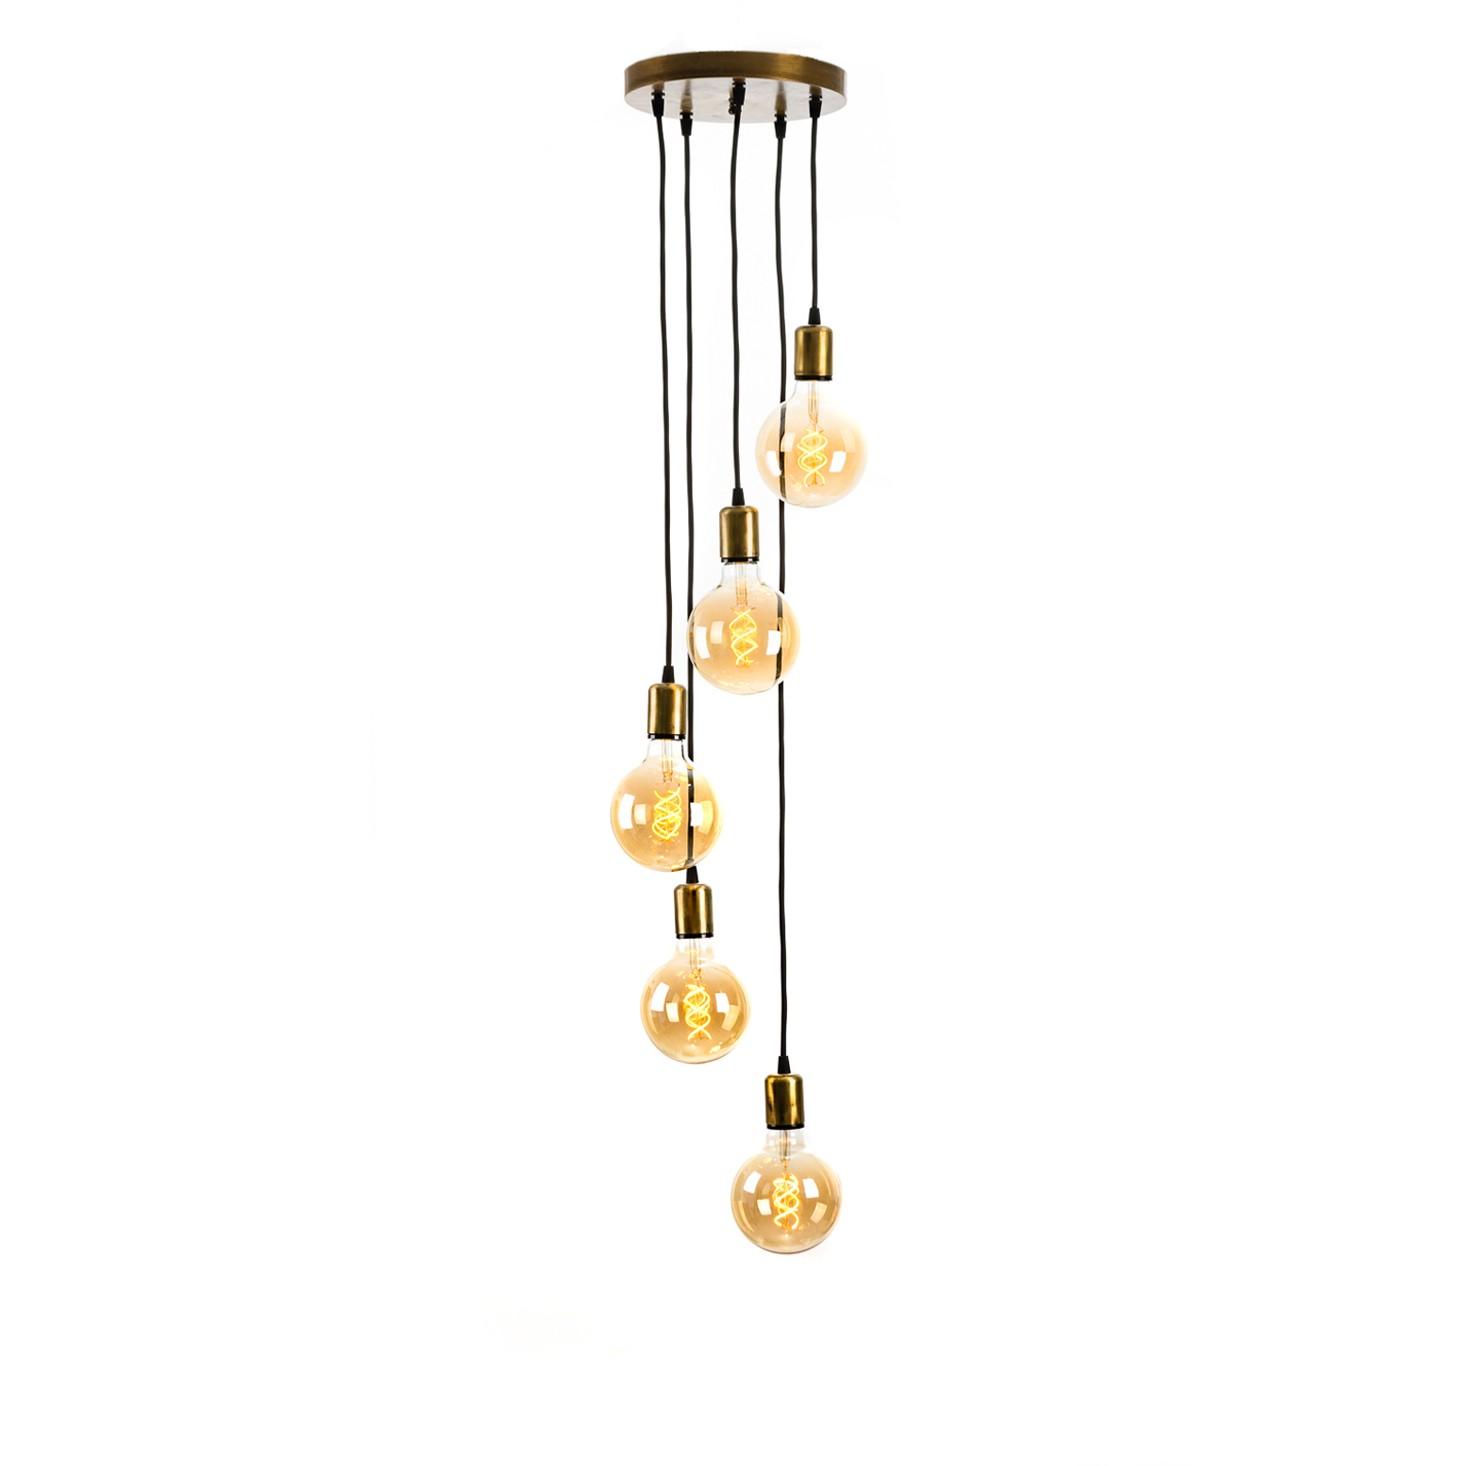 Vesna 05 Led Vintage Style Lamp Designed By Lampionstudio